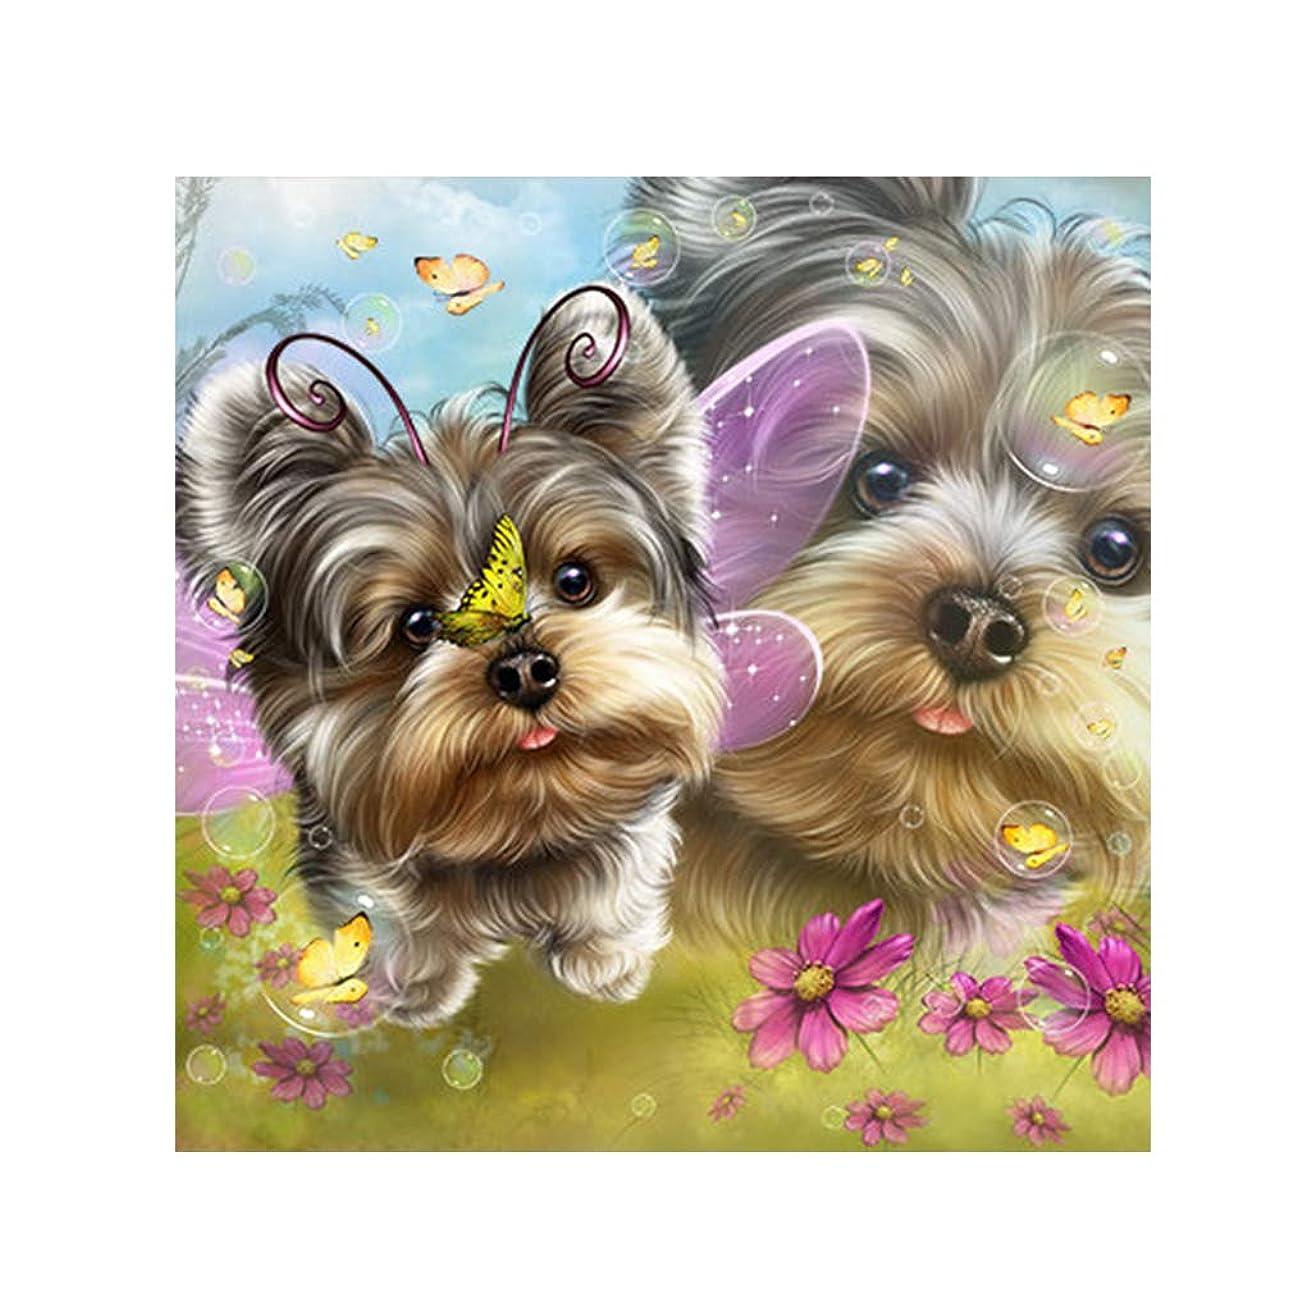 DIY 5D Diamond Painting Full Drill Rhinestone Embroidery for Adult Diamond Painting Kit Paint with Diamonds Wall Decor Dogs (11.8X11.8inch)